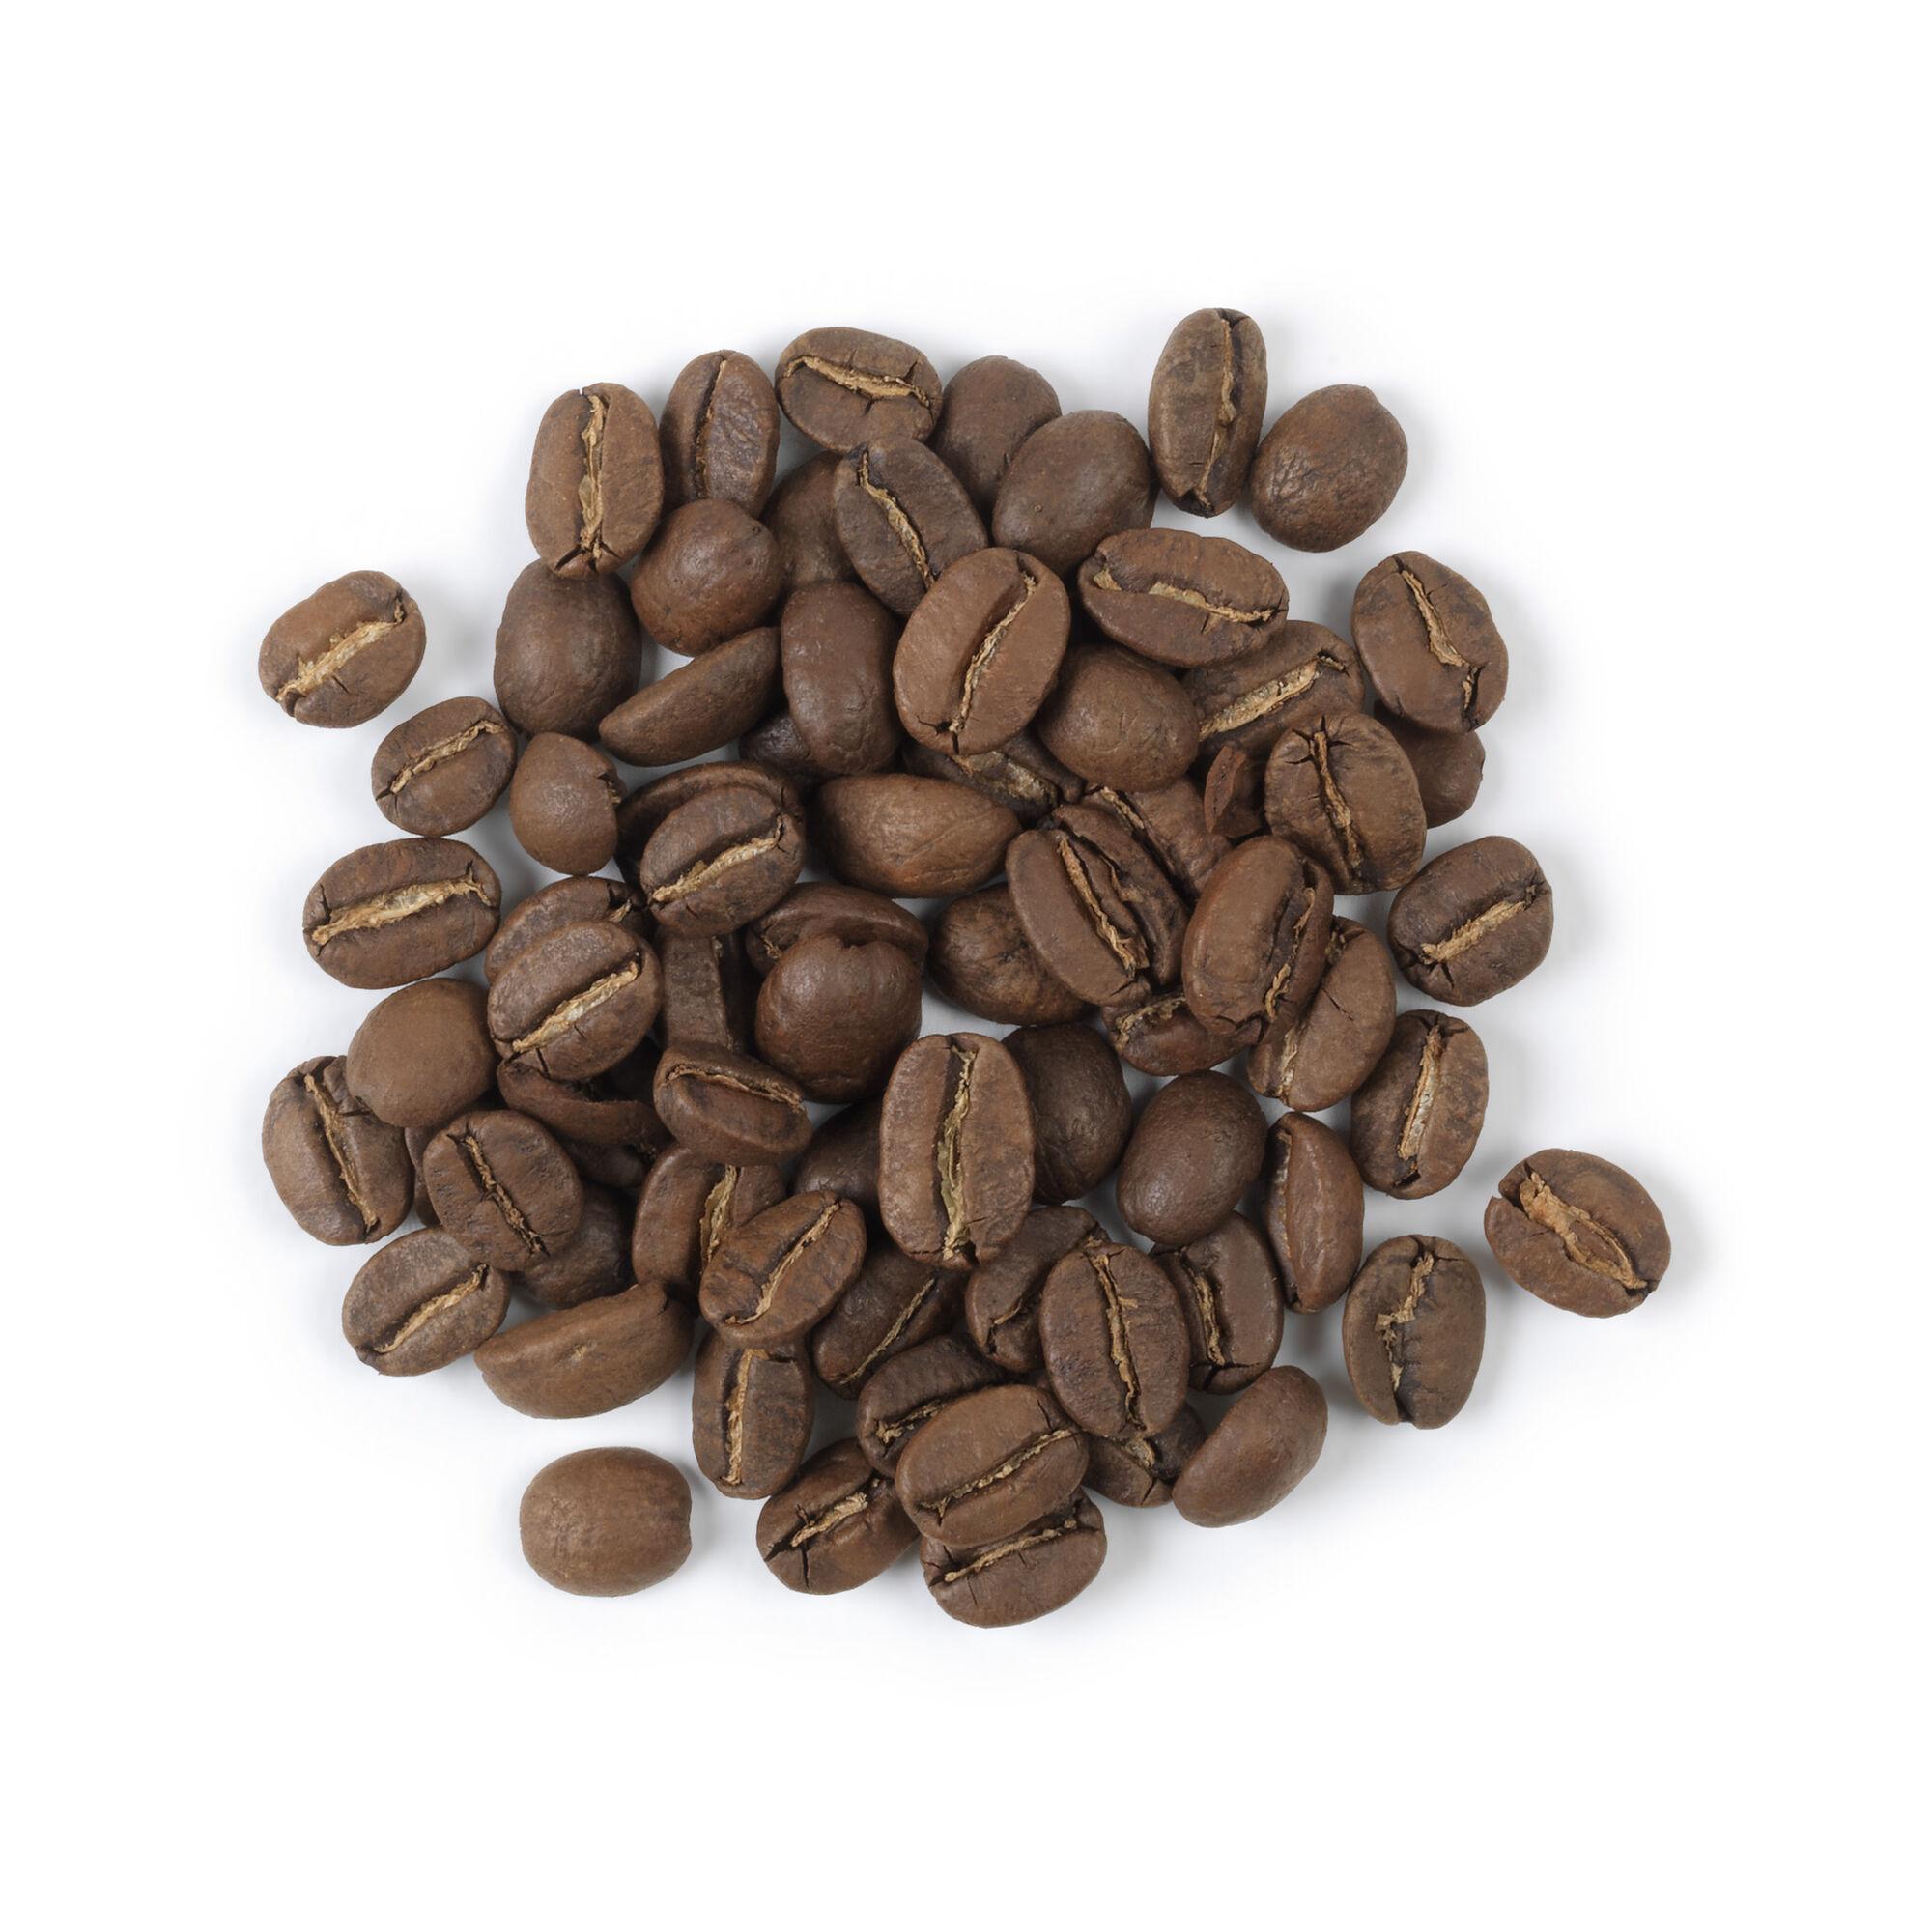 Jamaica Blue Mountain Coffee Whittard Of Chelsea